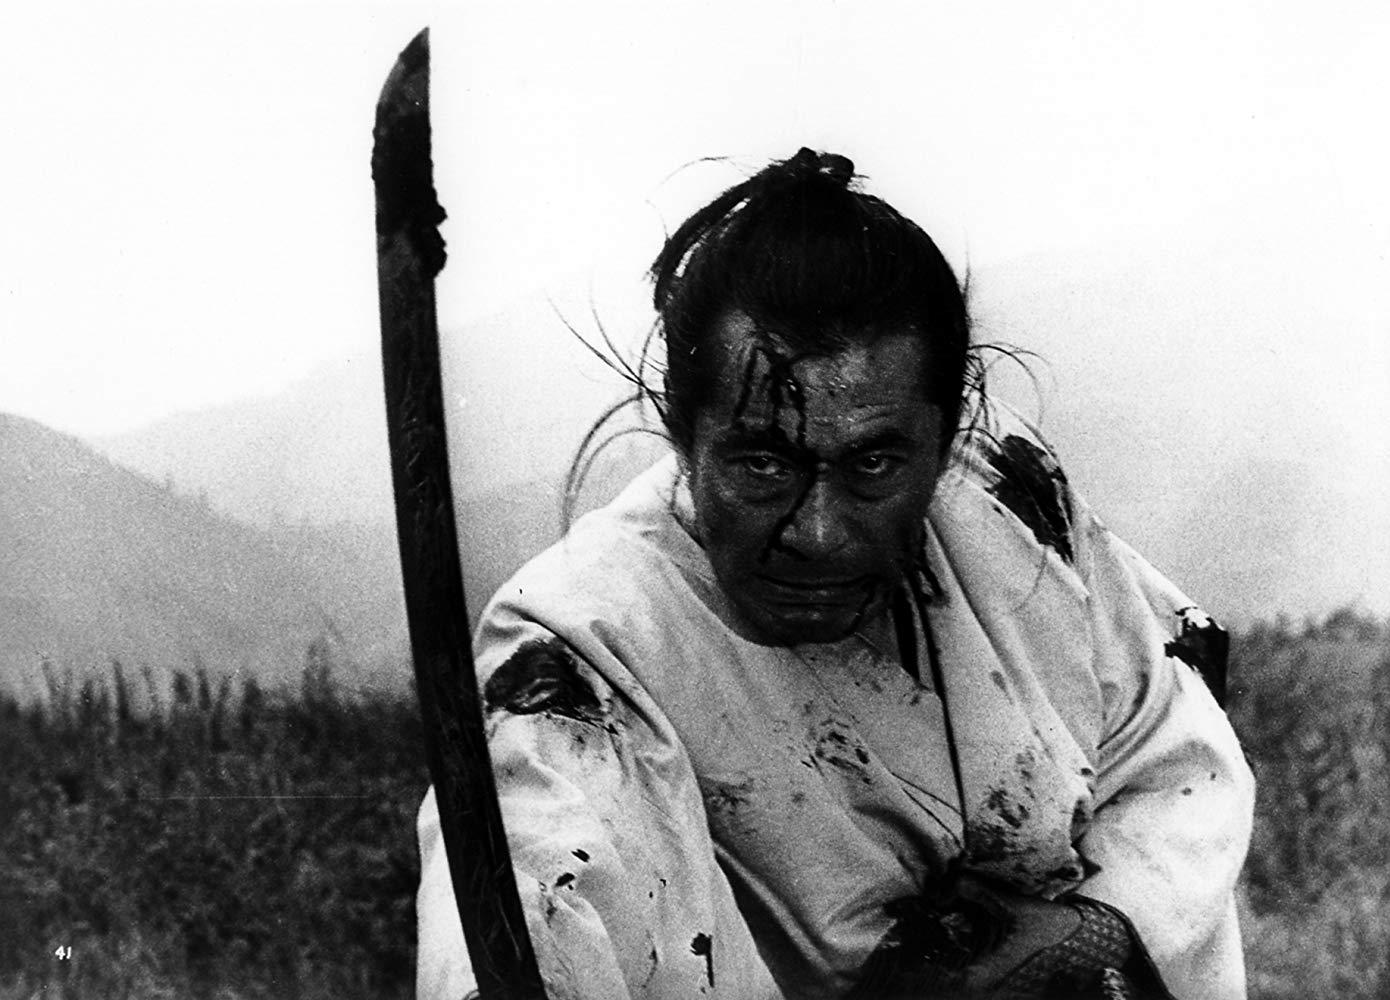 287. Samurai Rebellion (1967)